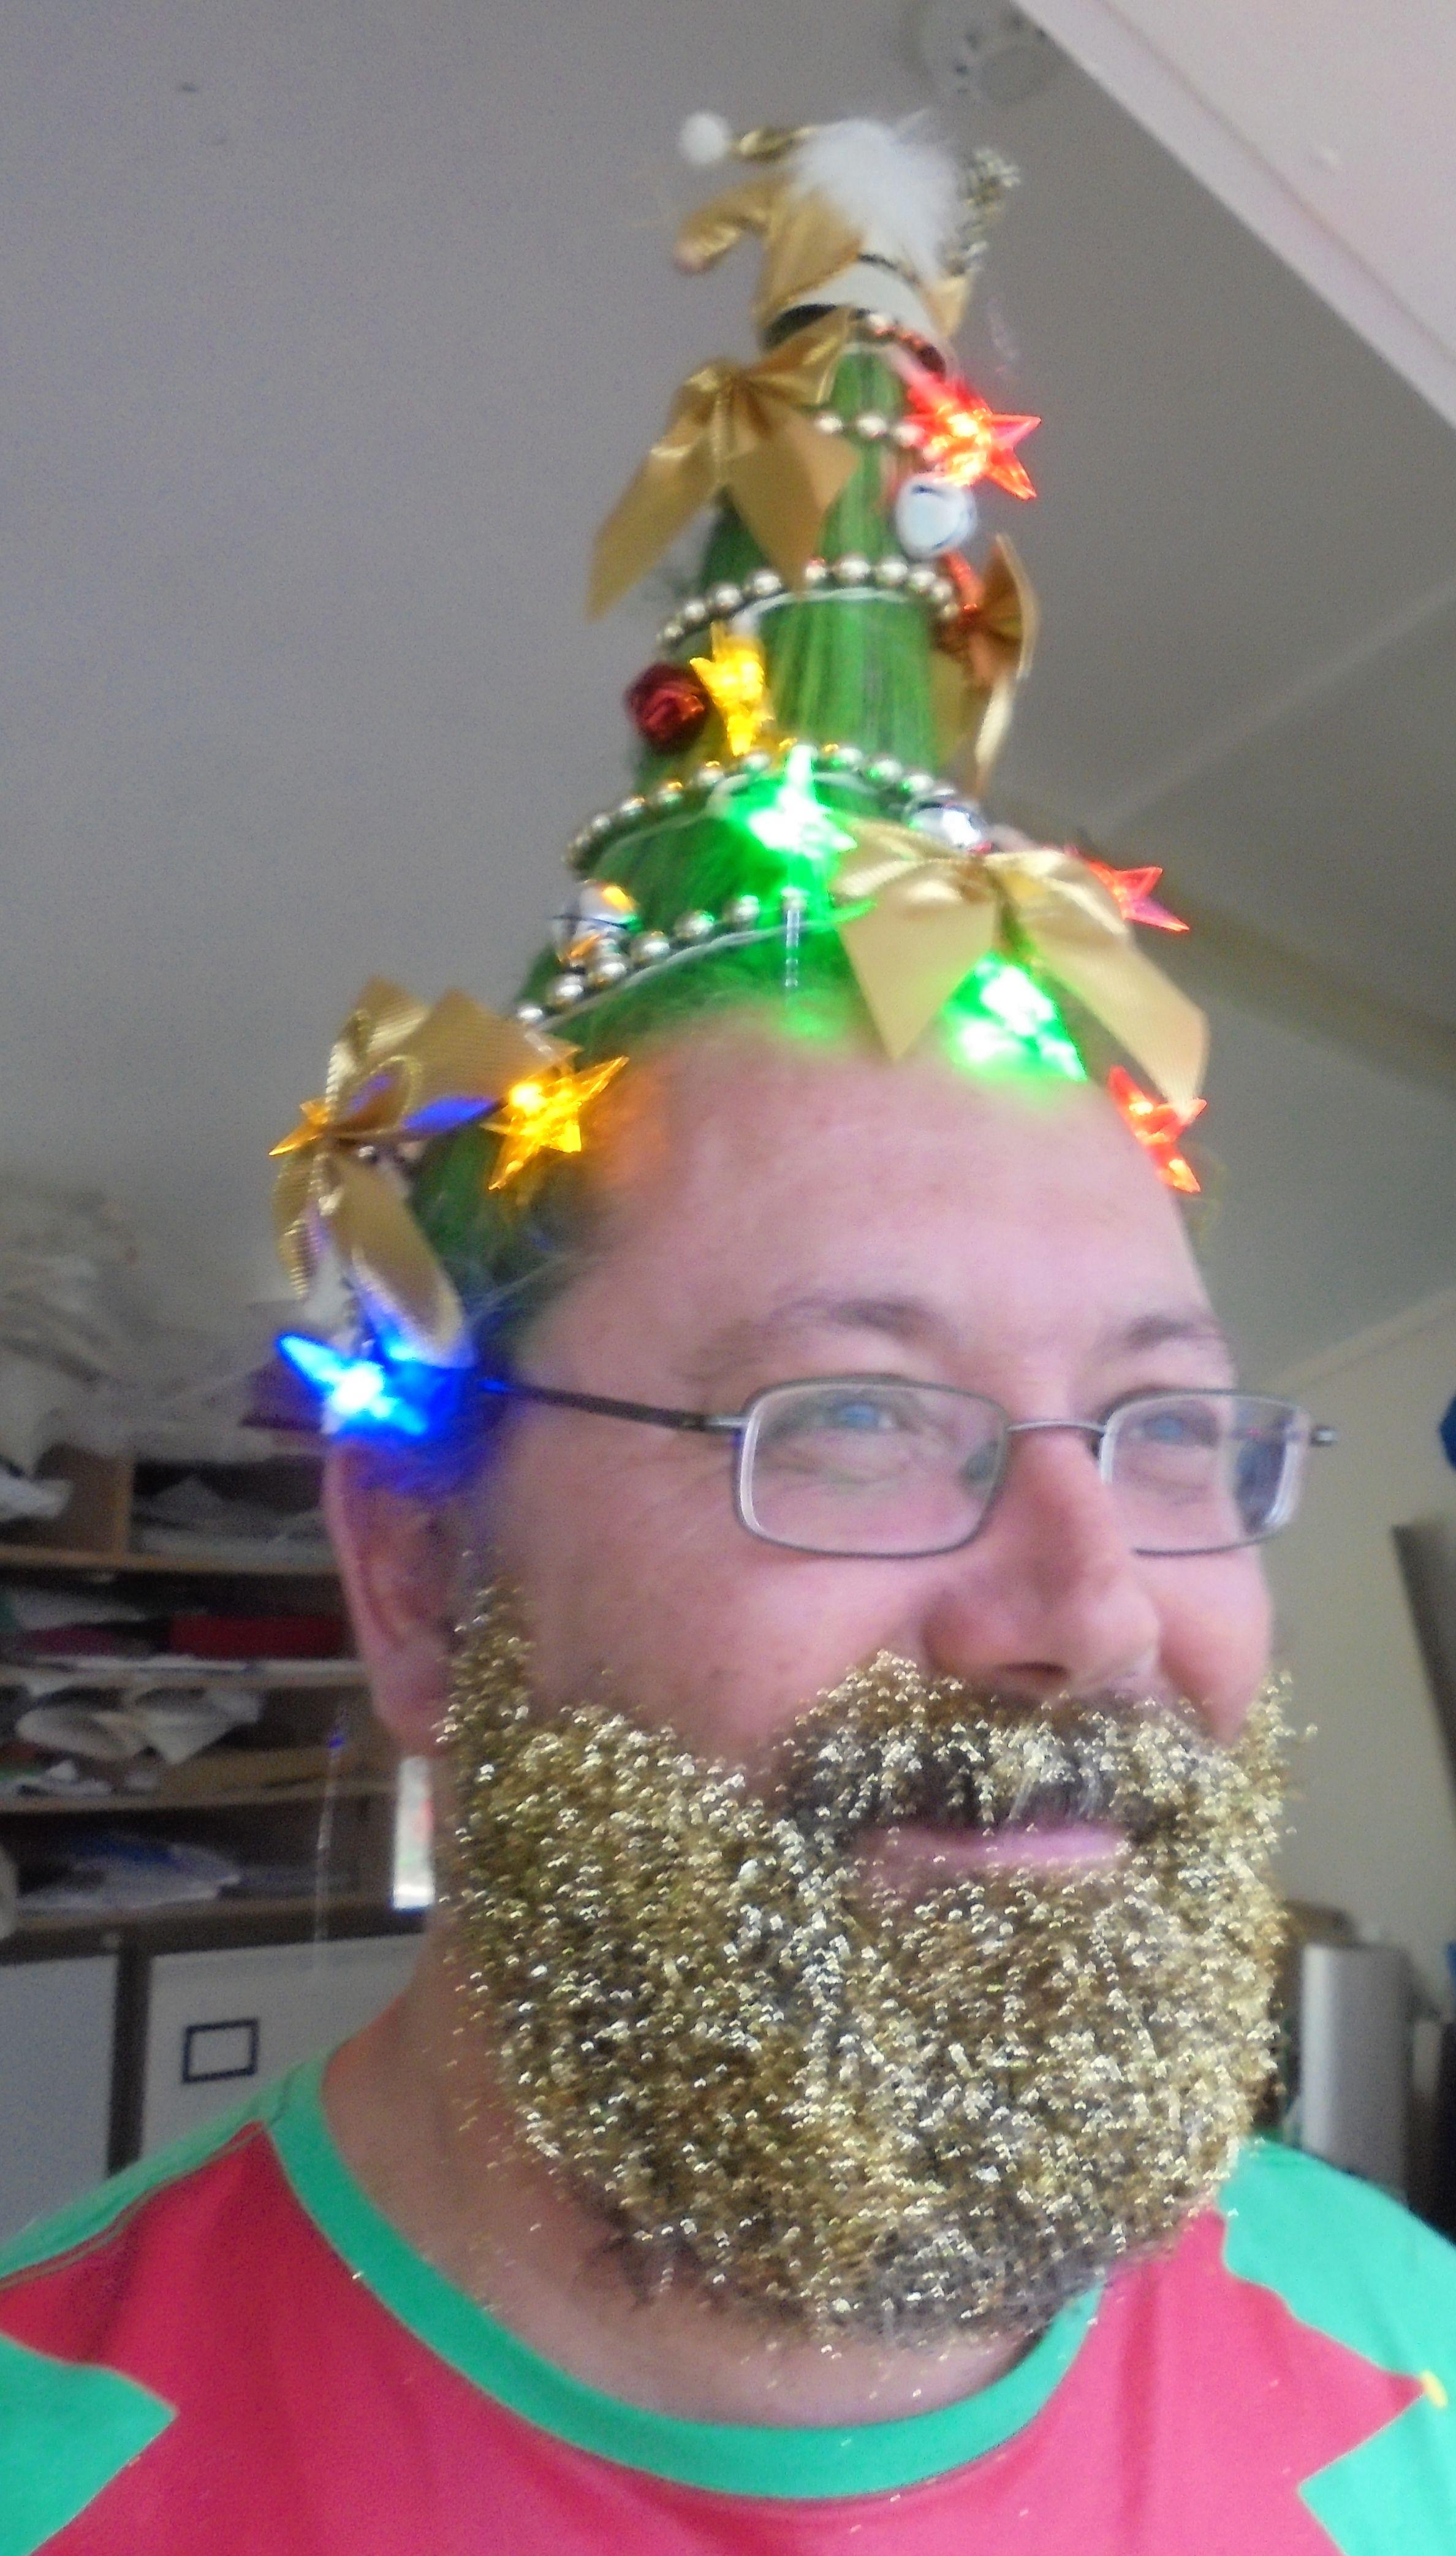 Christmas Tree Hairstyle Fairy Lights Green Hair Spray Xmas Hair